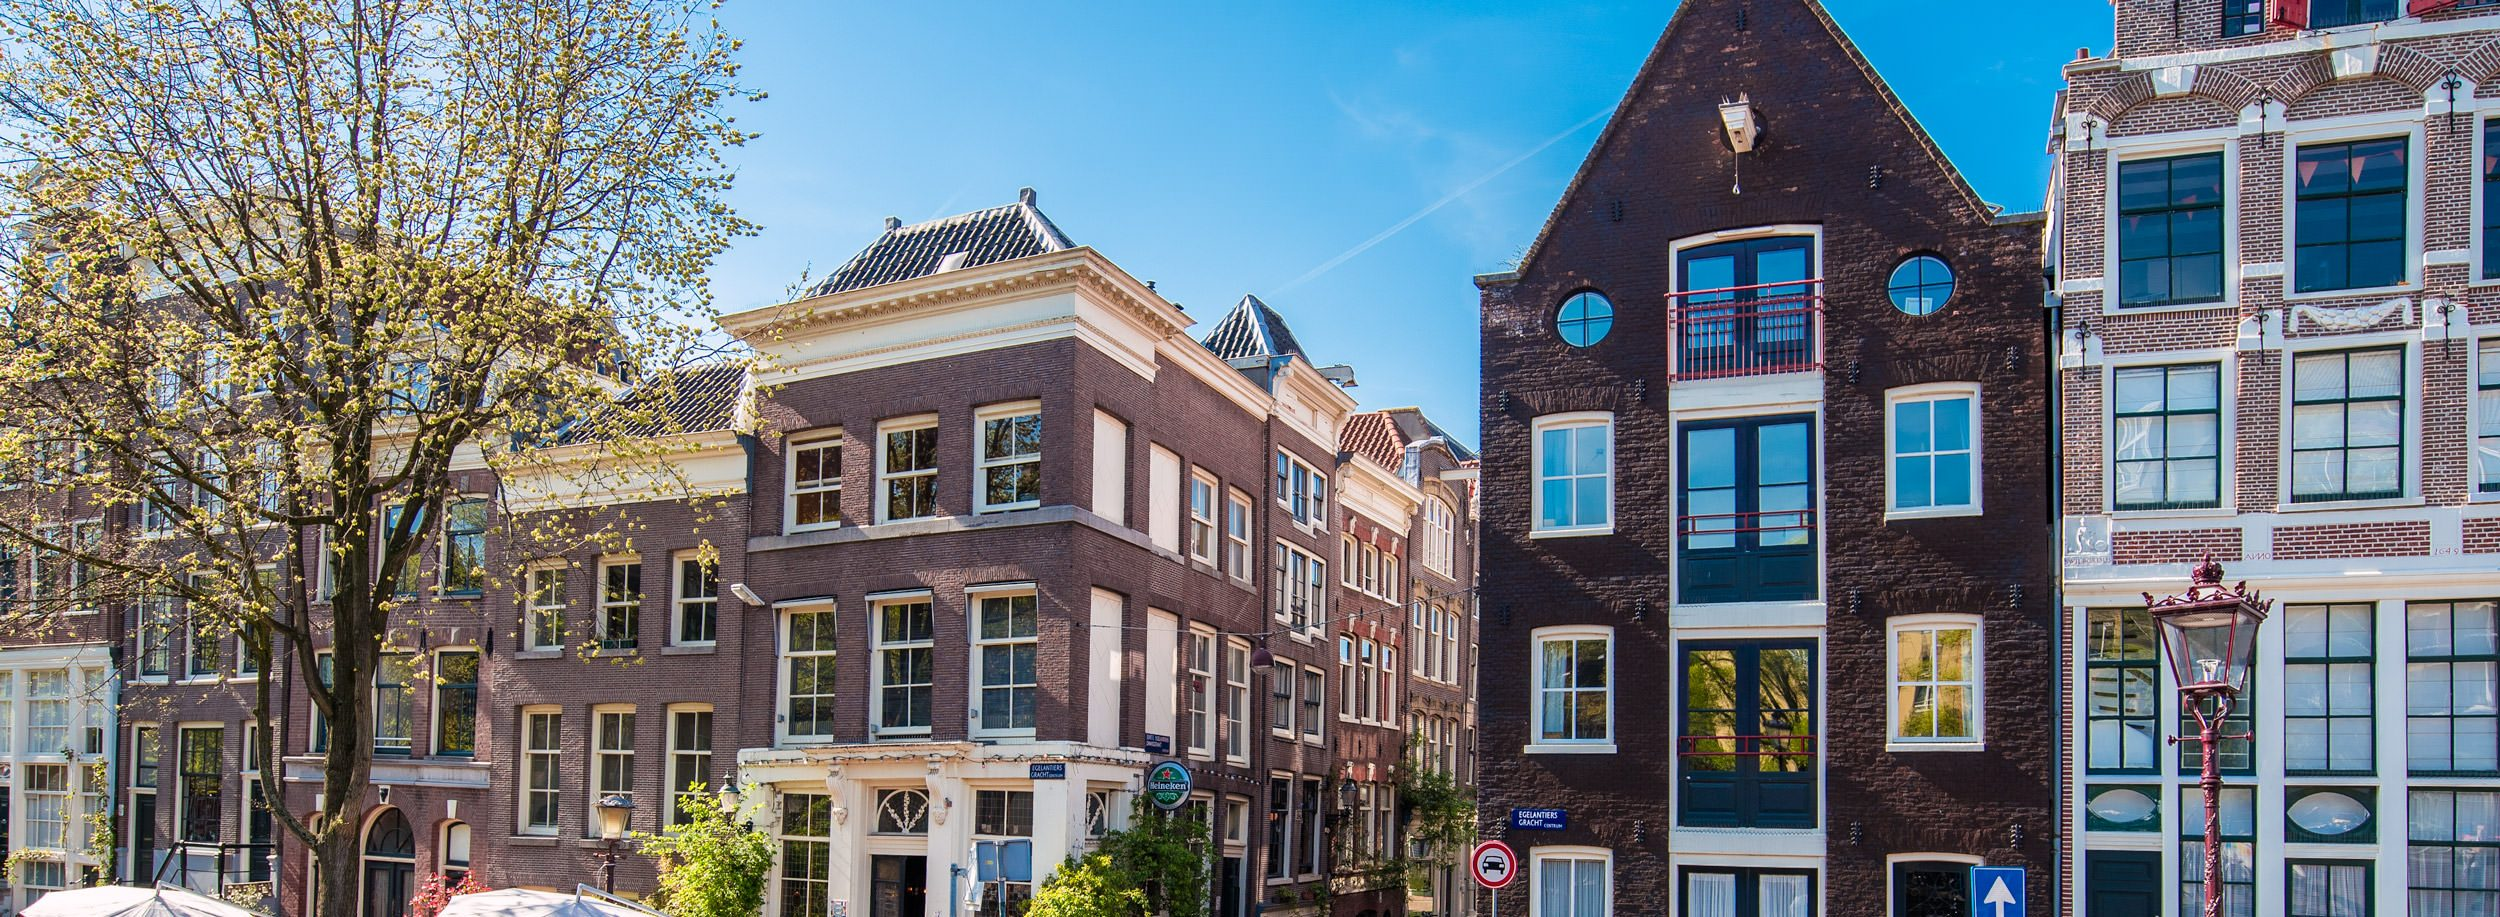 moje-miejsca-w-amsterdamie-holandia